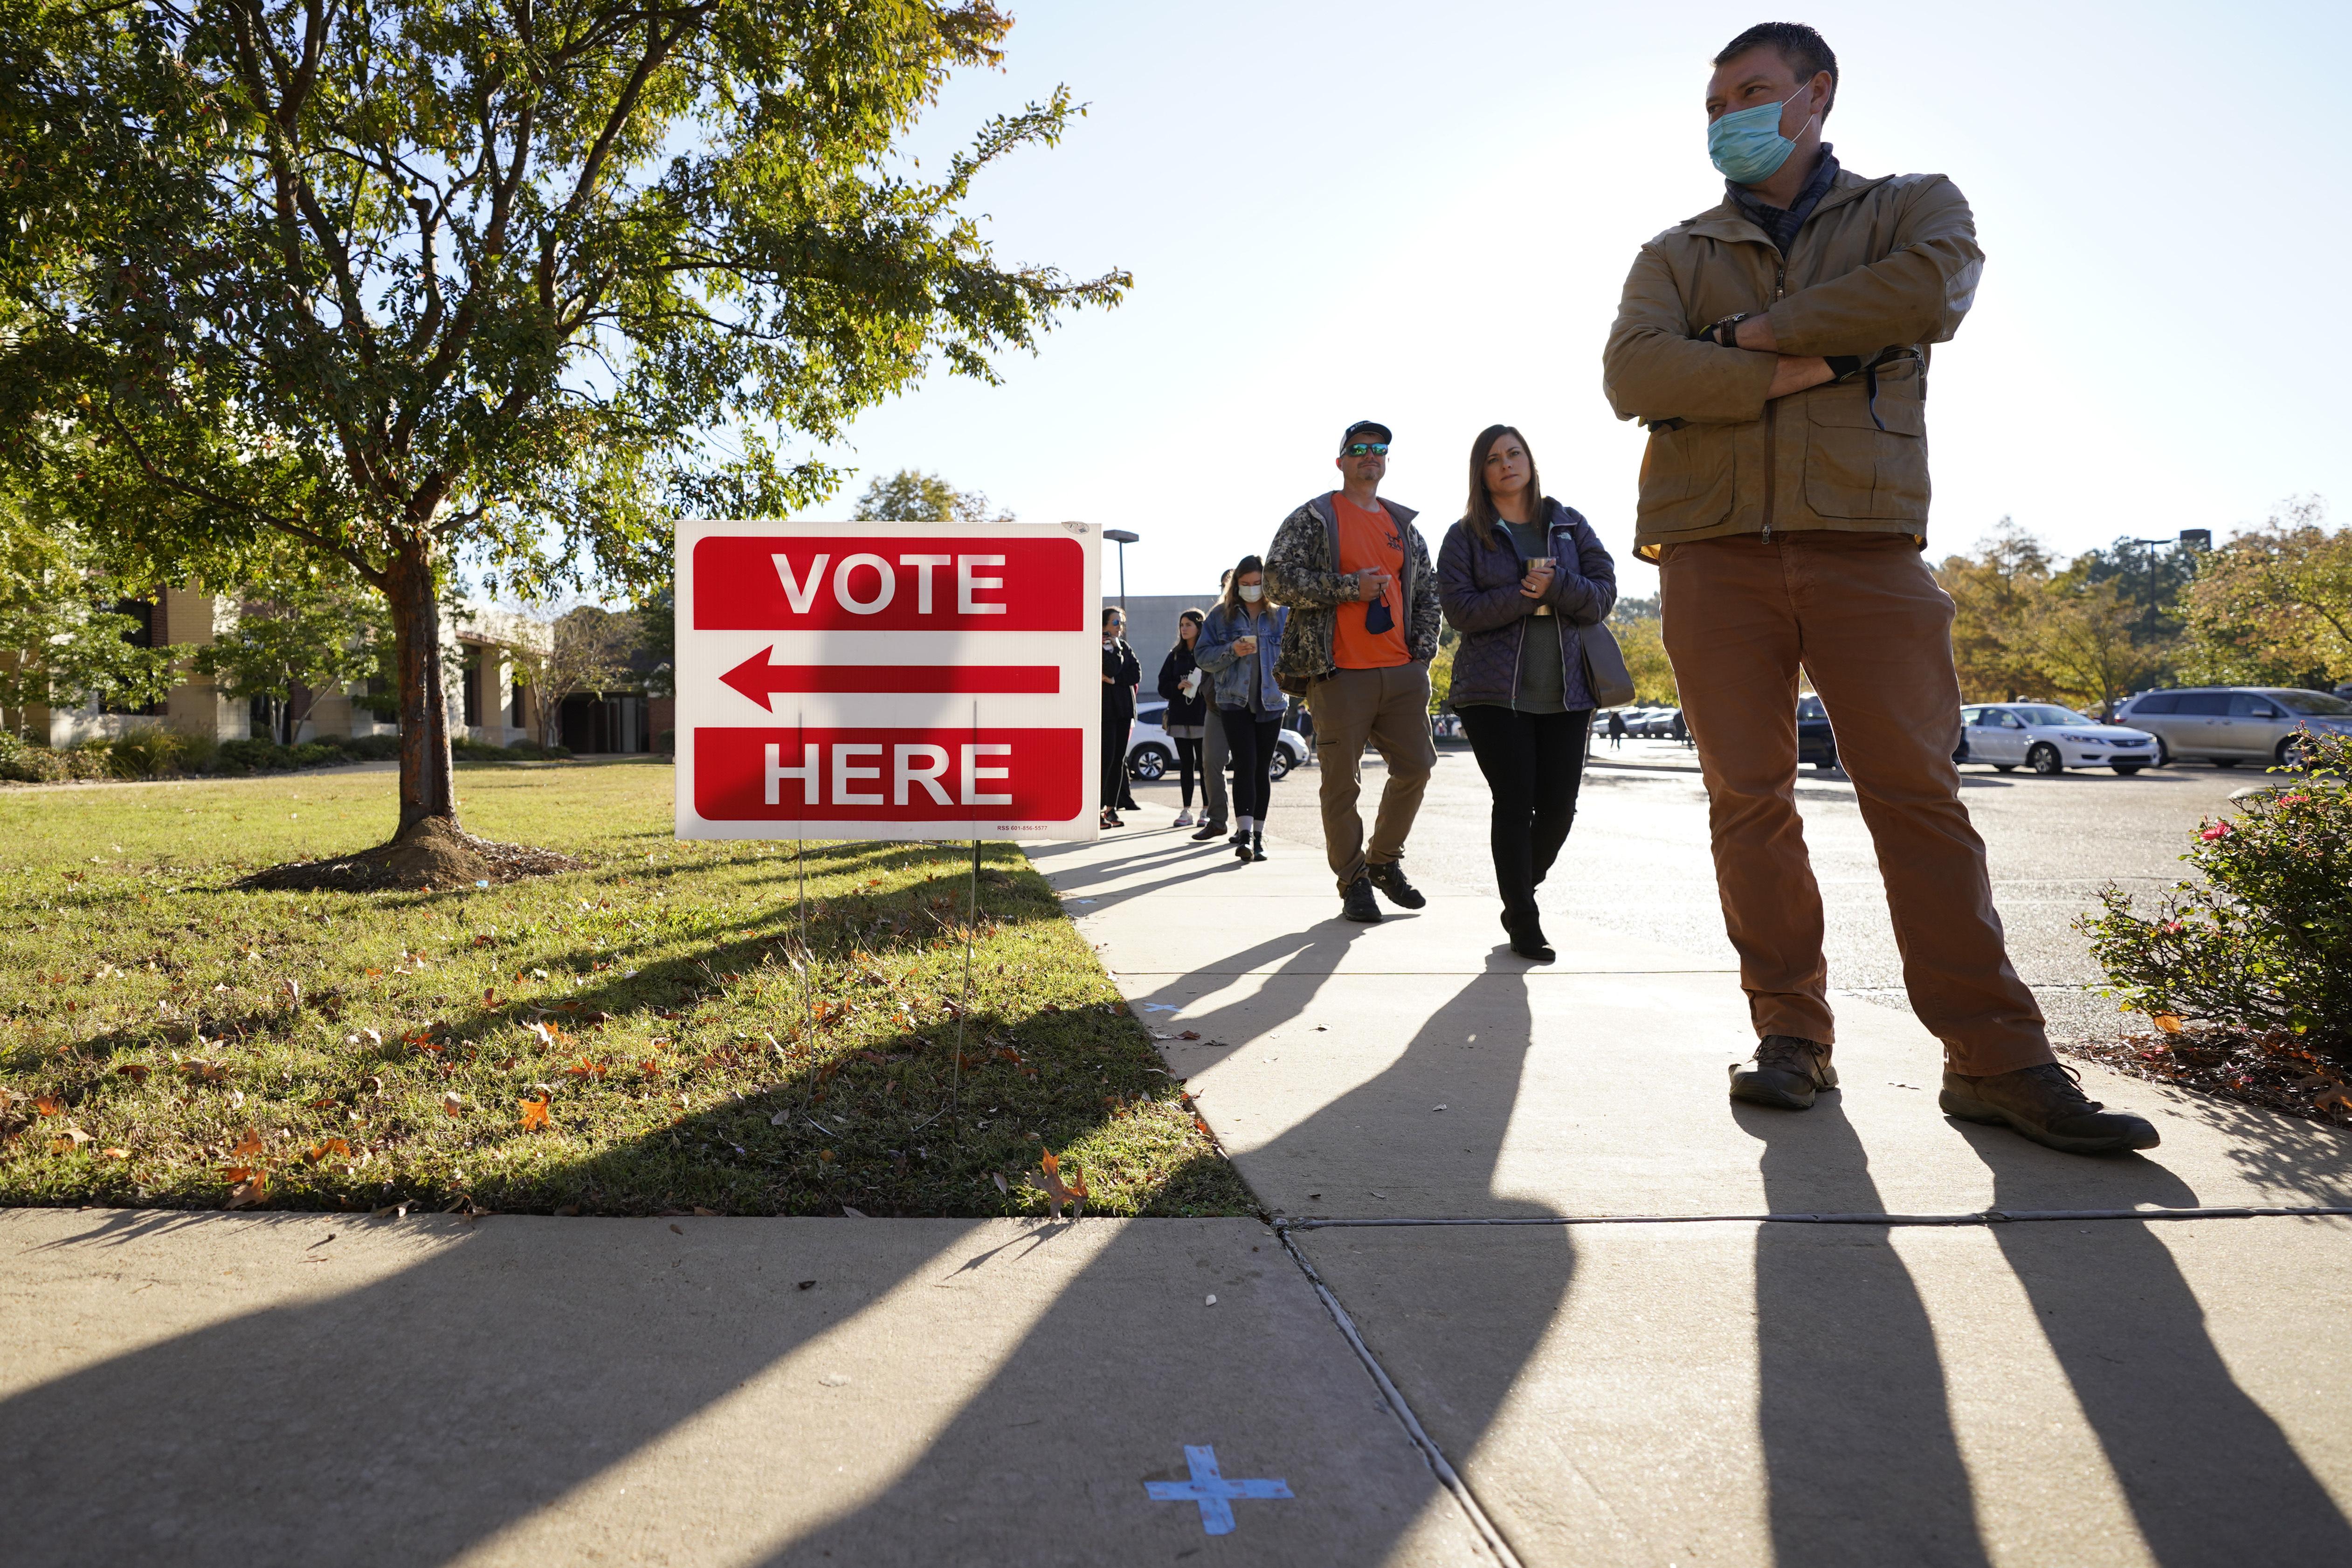 Voters wait to cast their ballot in Ridgeland, Miss.